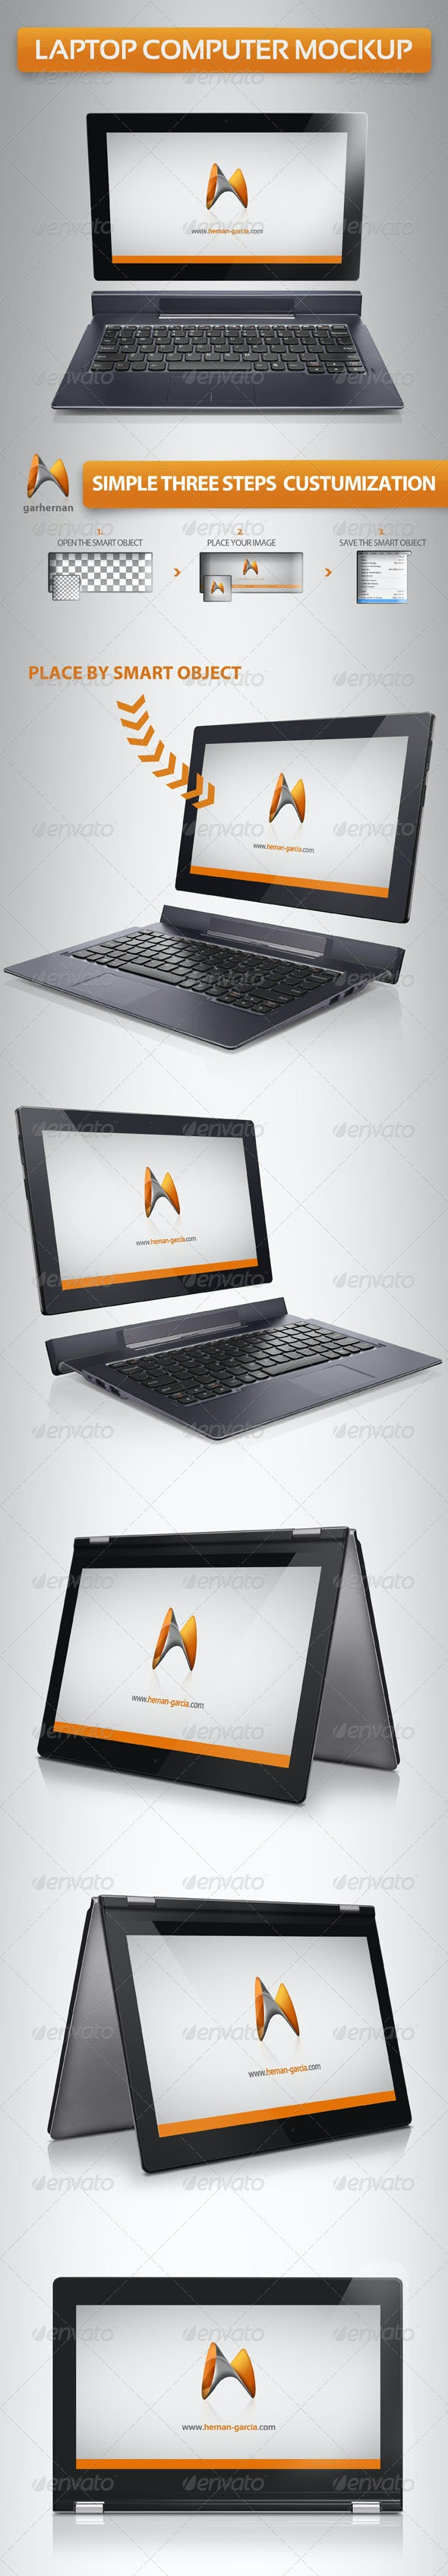 Laptop Computer Mockup - Laptop Displays